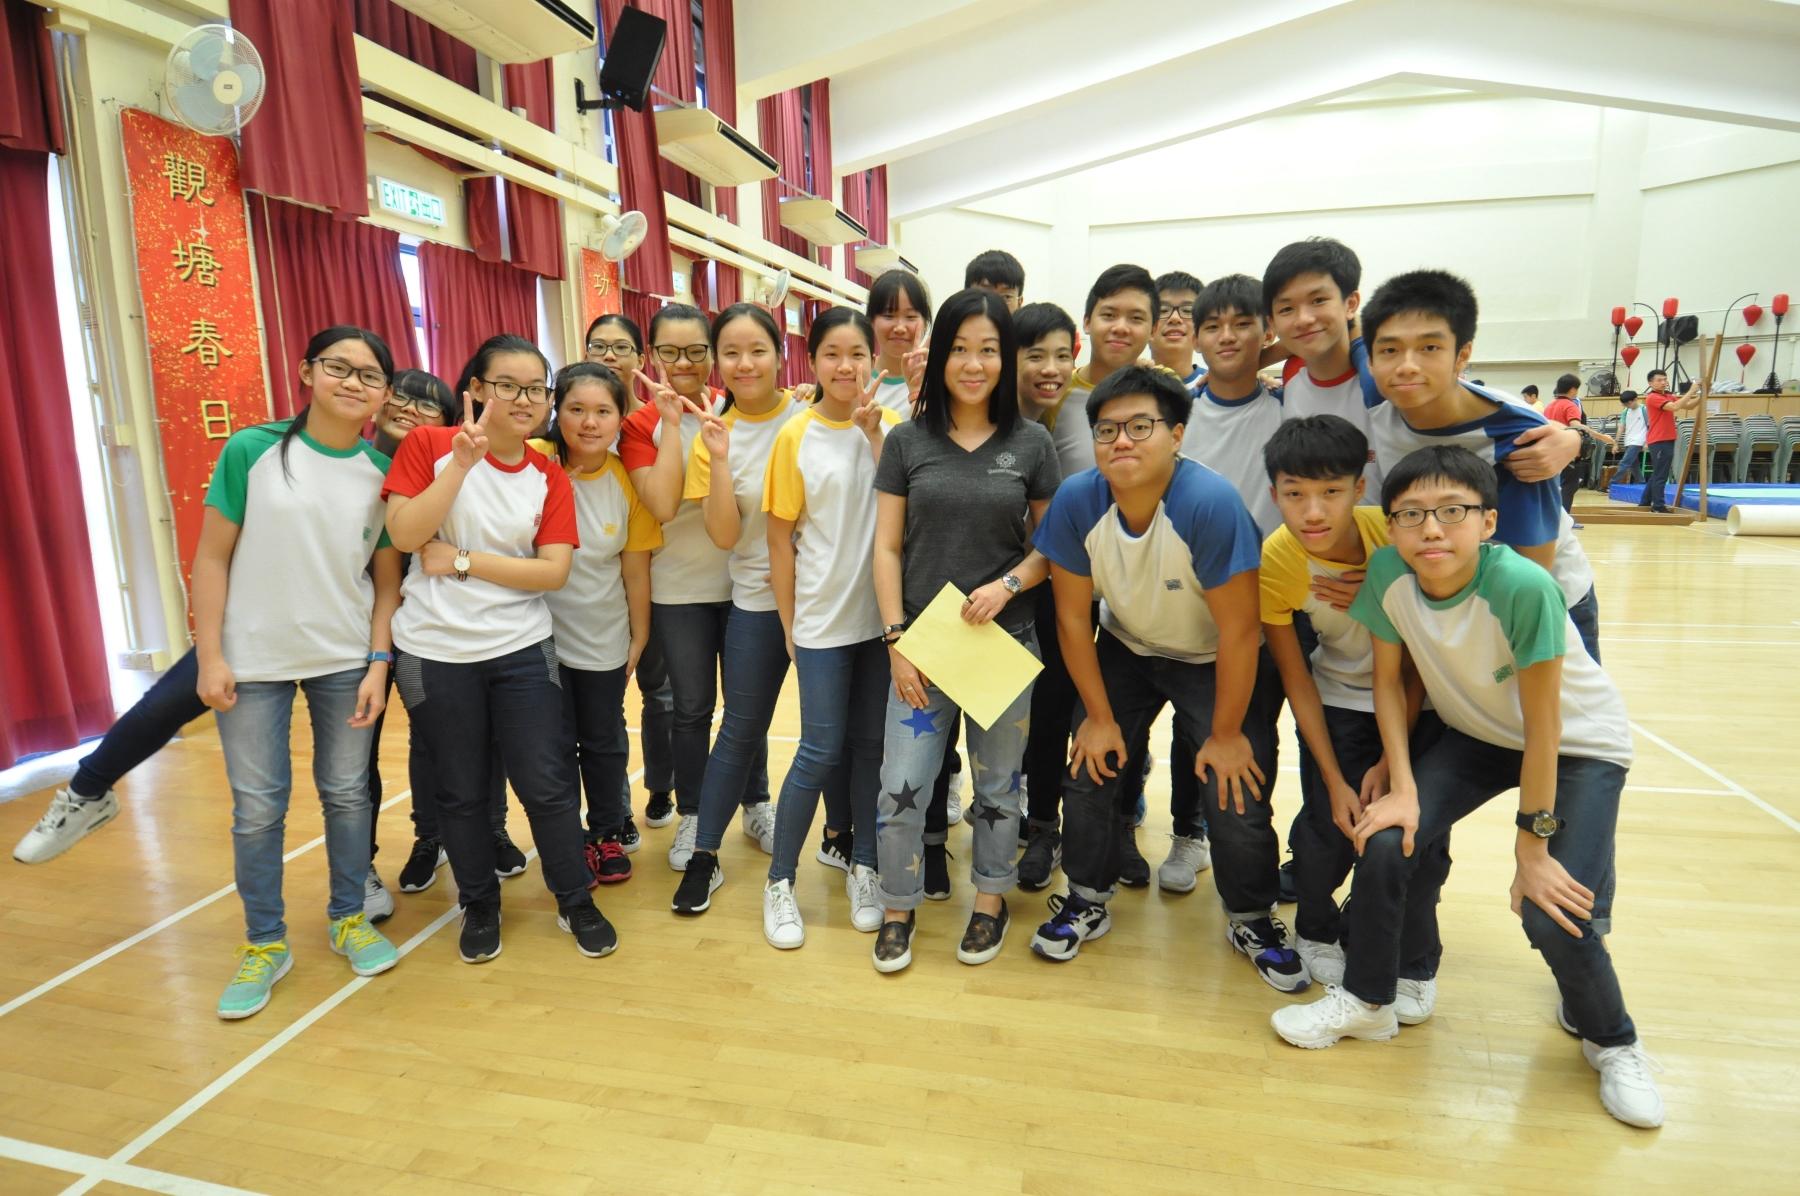 http://www.npc.edu.hk/sites/default/files/dsc_0589.jpg